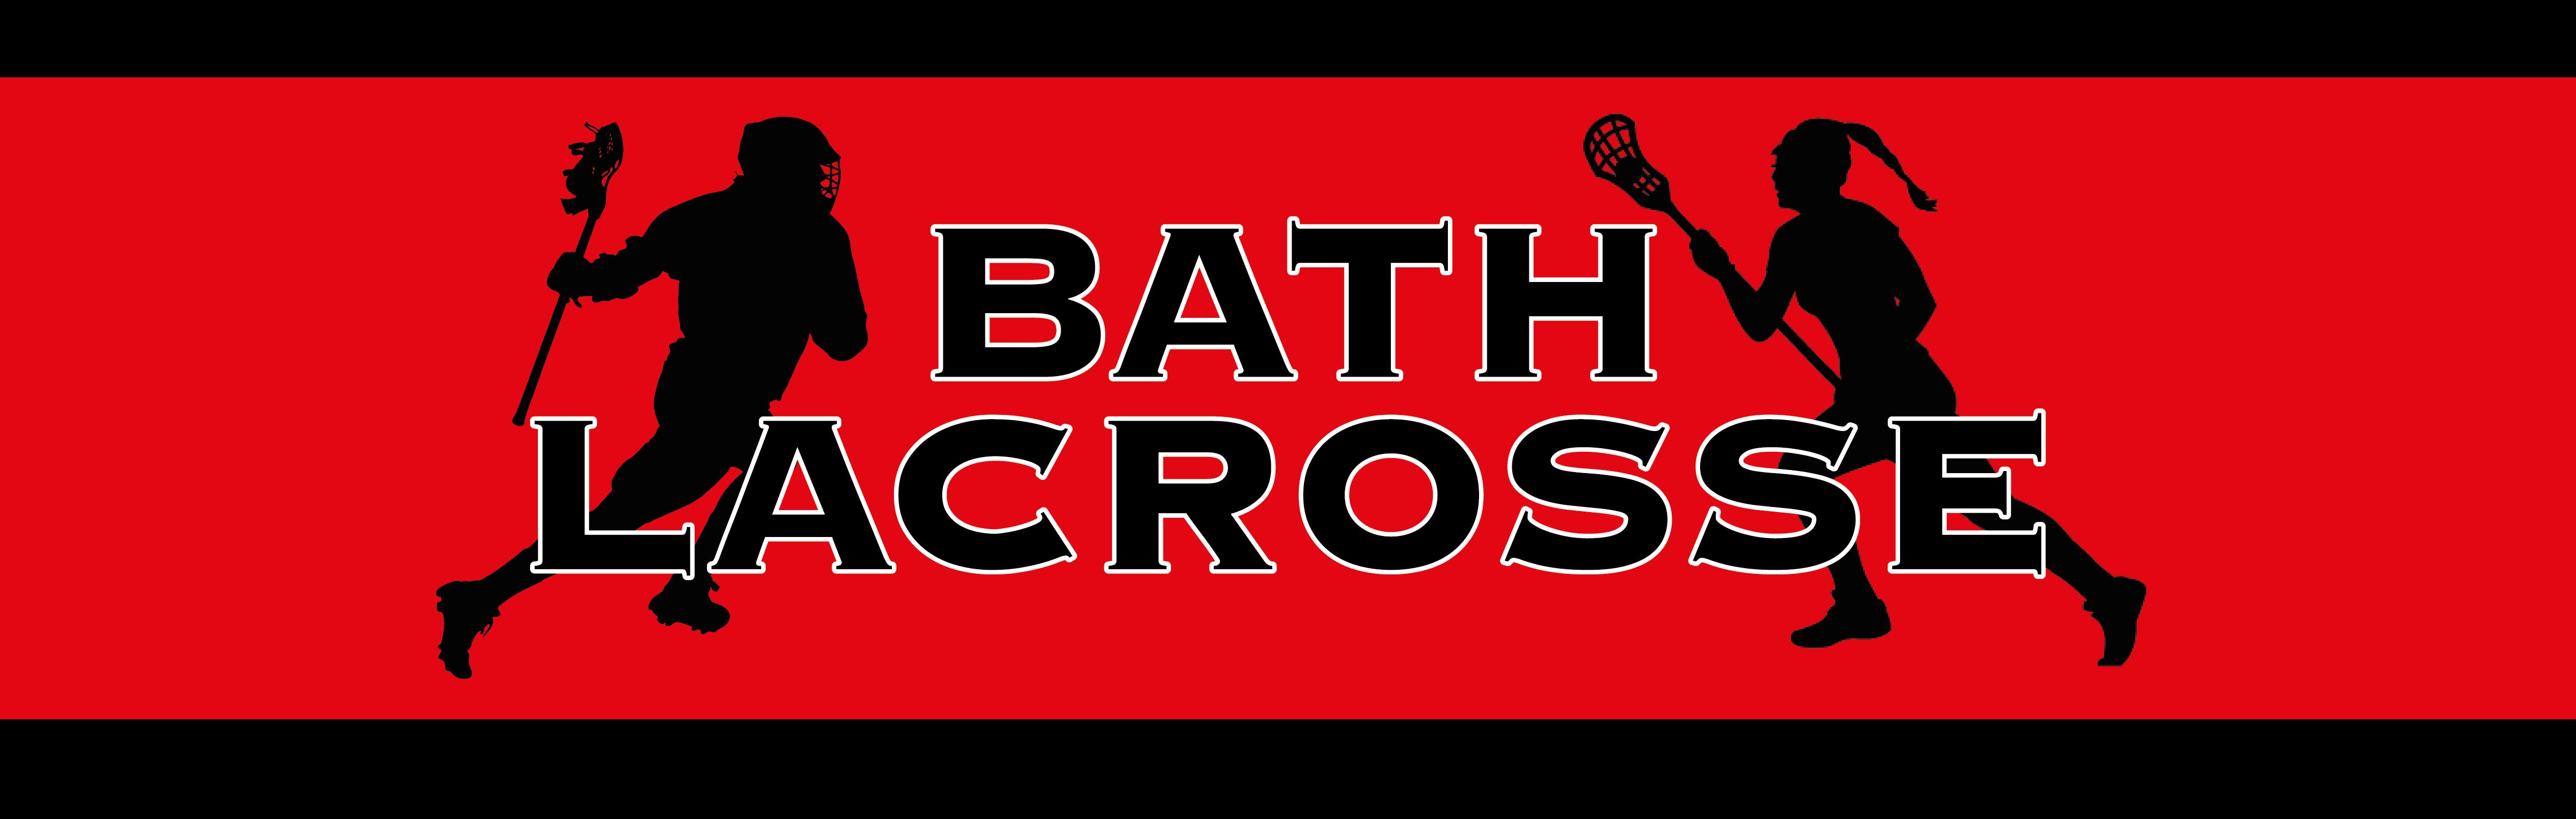 Bath Lacrosse